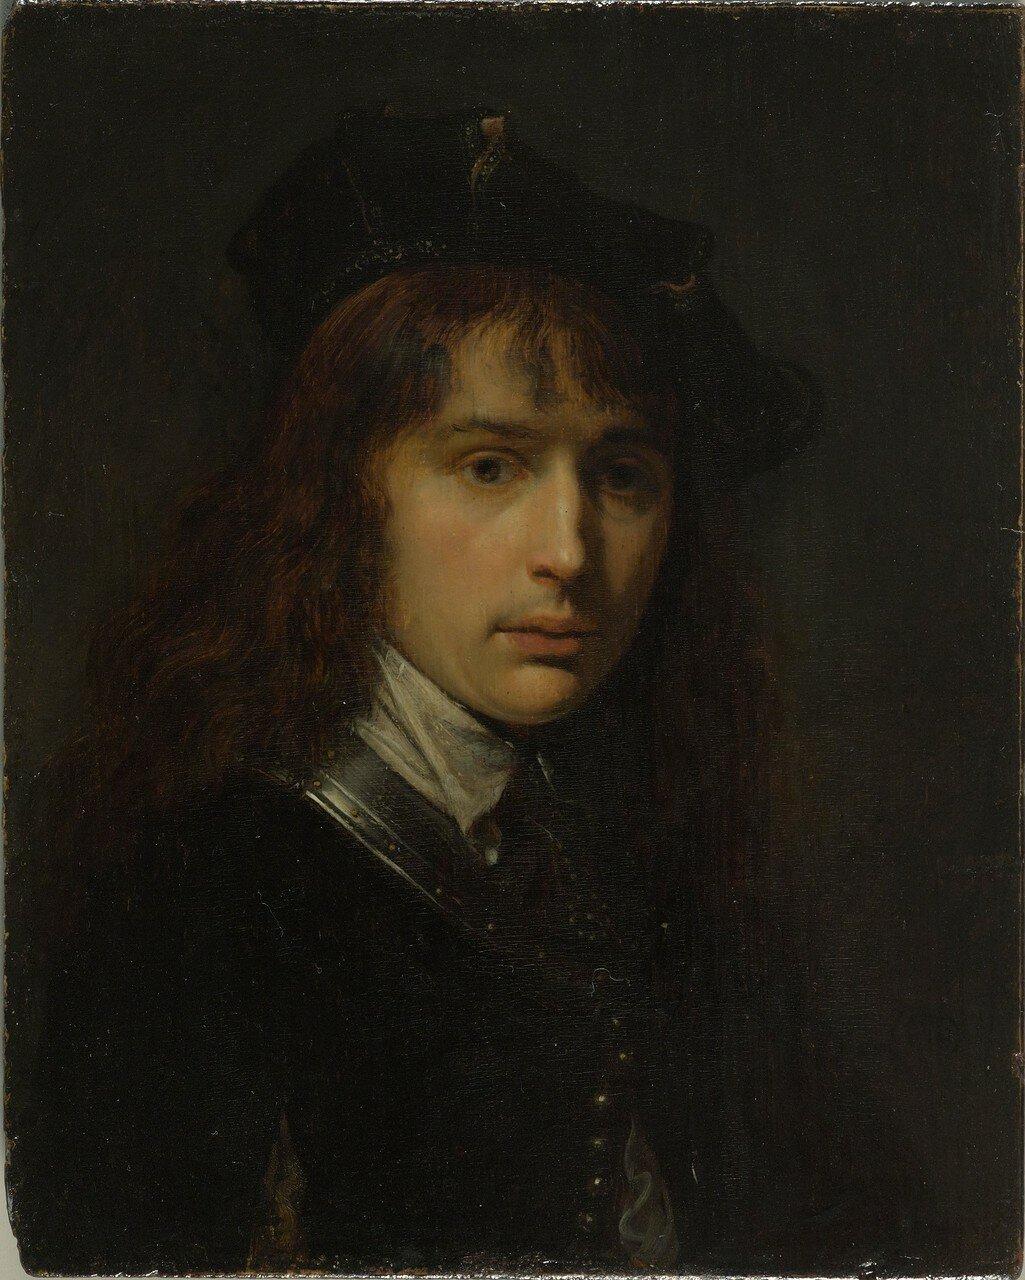 Gerrit_Dou_-_Self-Portrait_-_Google_Art_Project.jpg